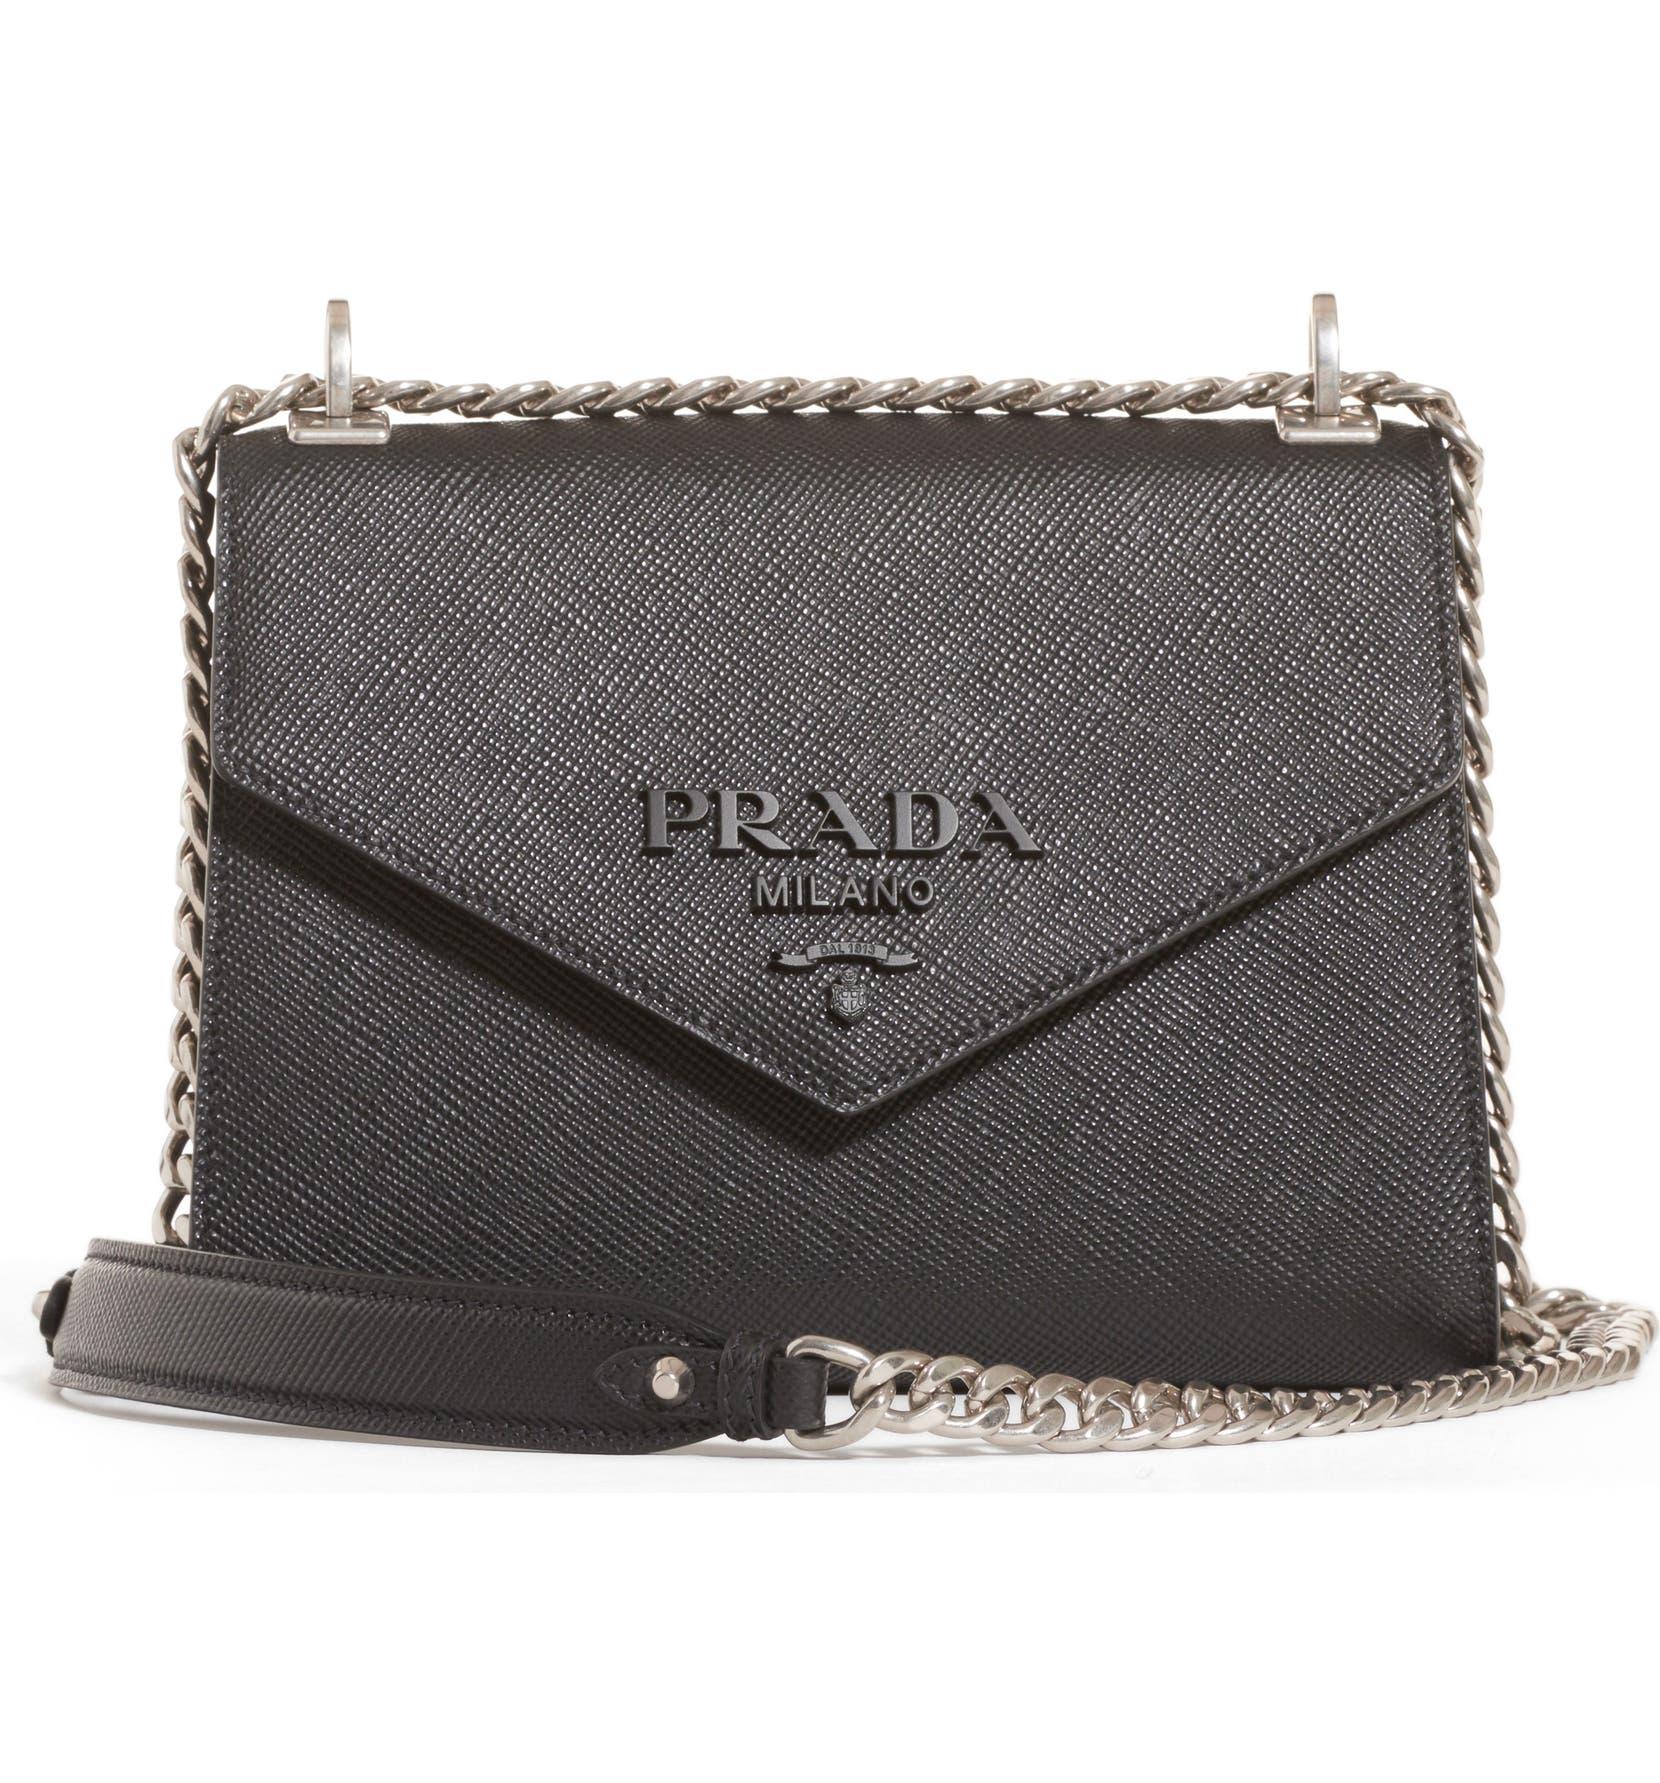 0f517ebe3915 Prada Monochrome Saffiano Leather Shoulder Bag | Nordstrom